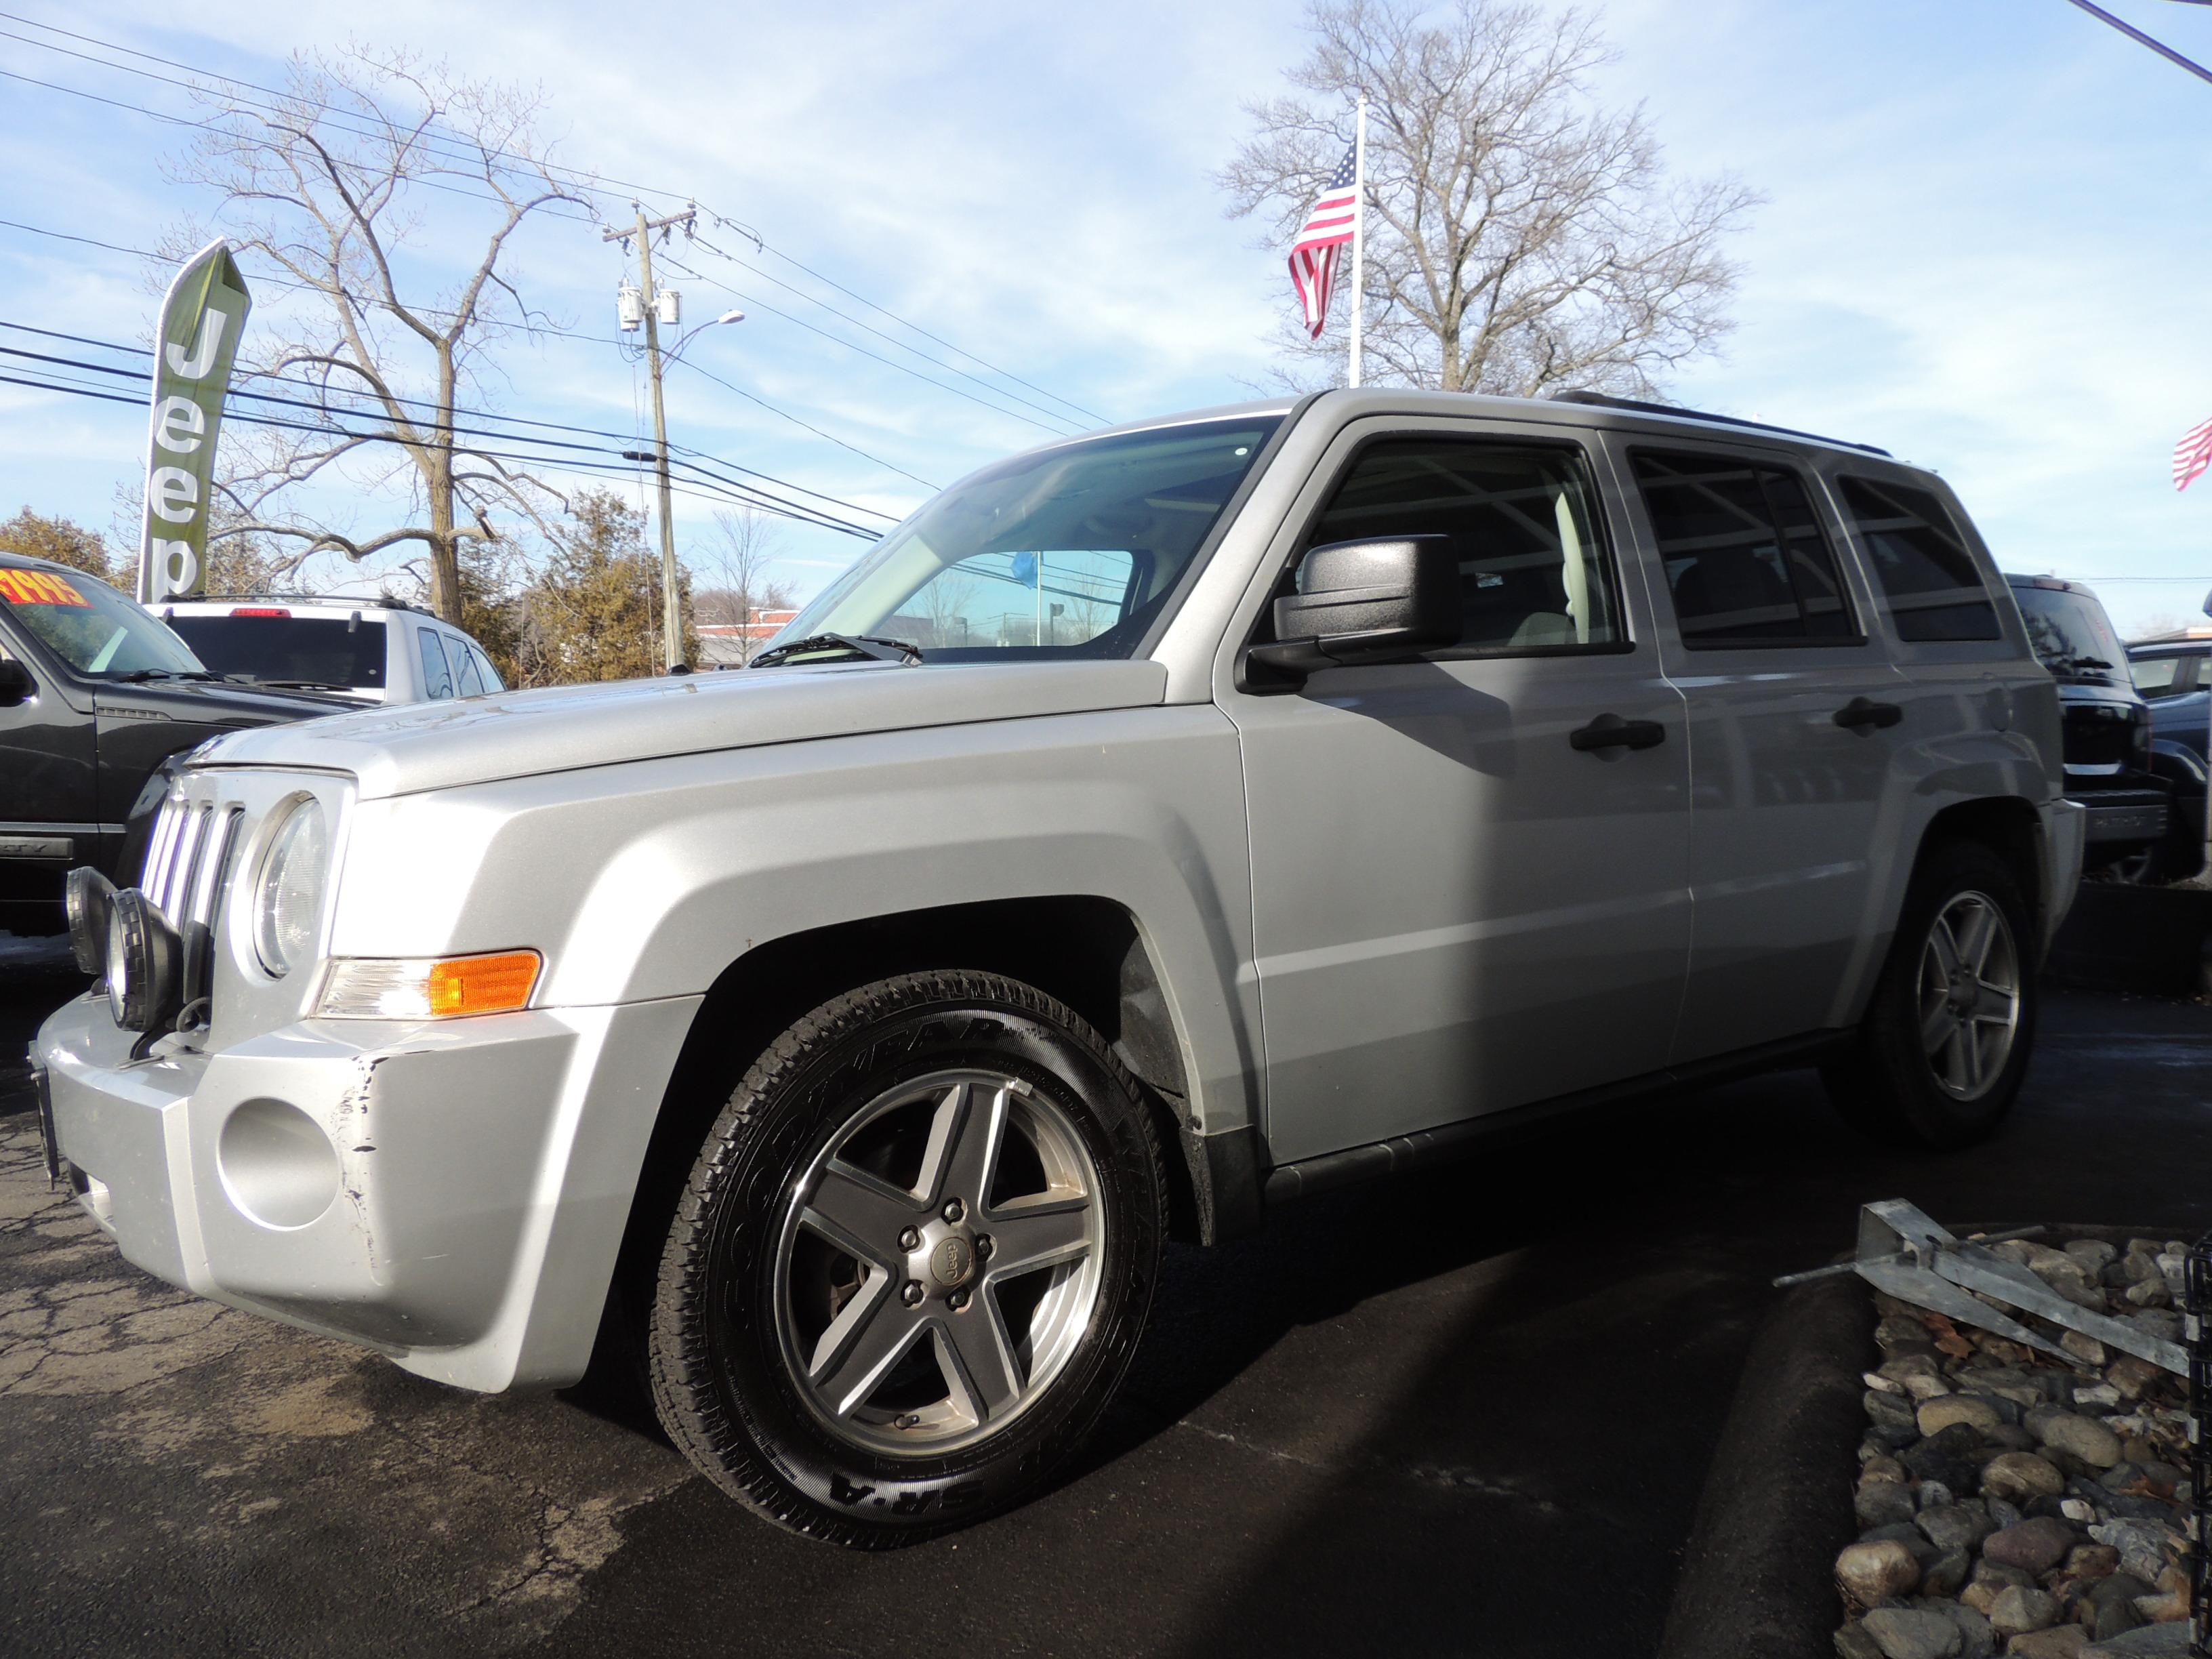 Jeeps For Sale In Ct >> 2008 Jeep Patriot | Shoreline Auto Sales